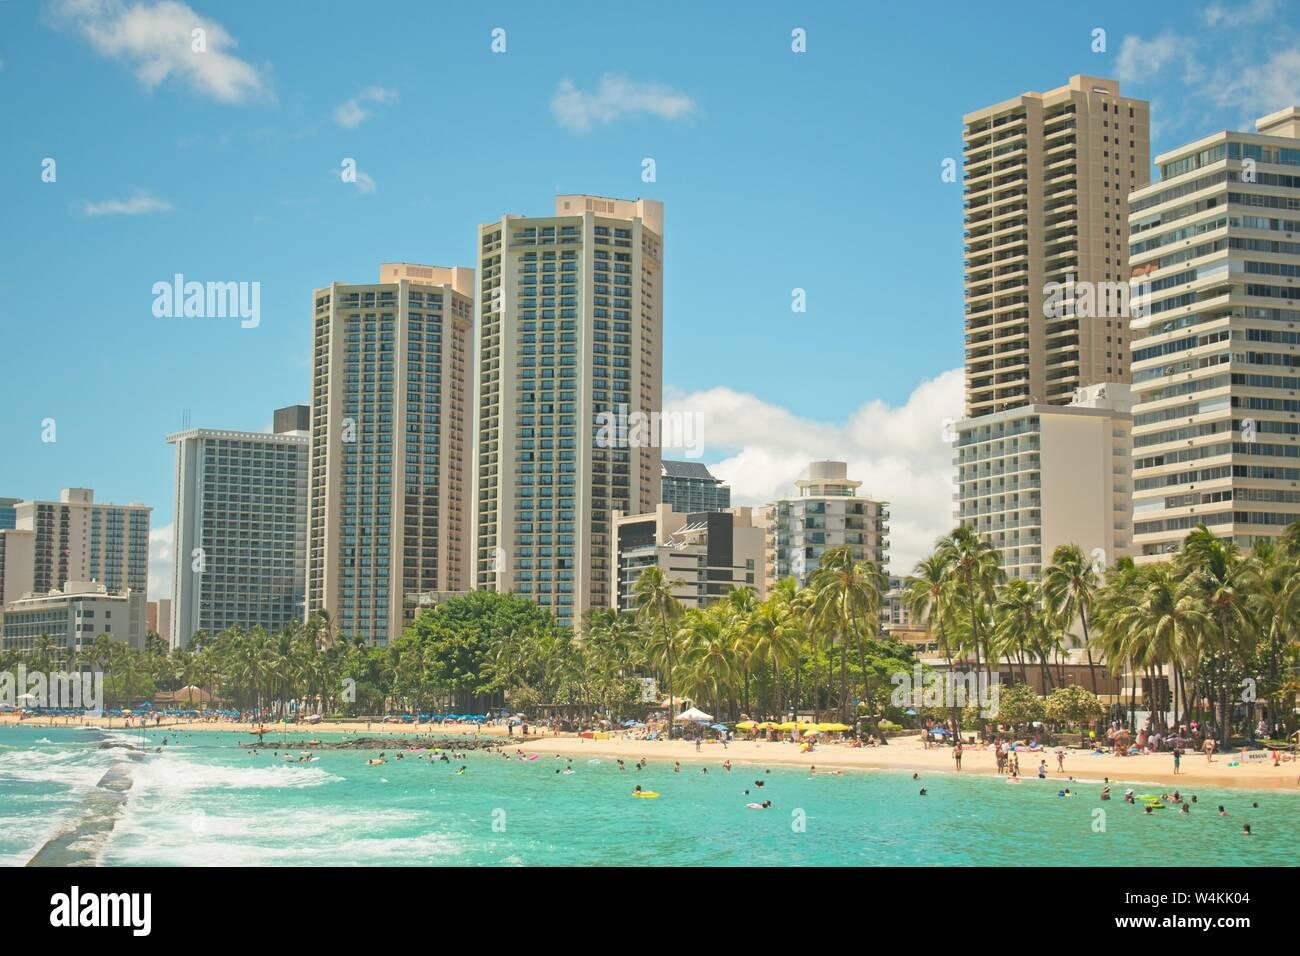 Skyscrapers In Waikiki Beach Hawaii Stock Photo 261046132